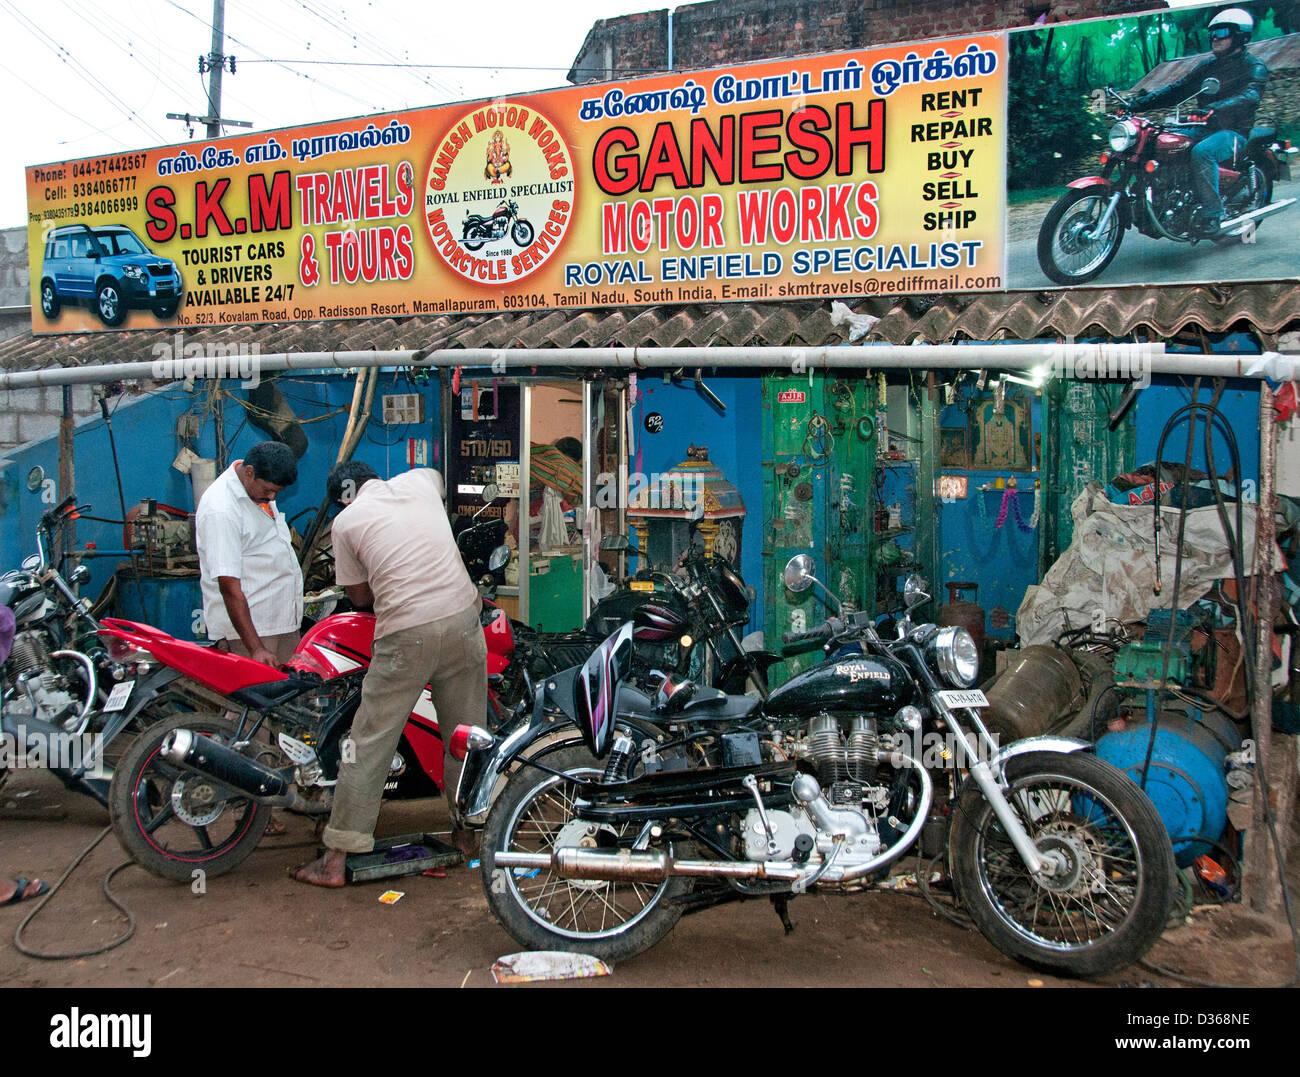 Royal Enfield Specialist motor workshop garage repair Covelong  ( Kovalam or Cobelon ) India Tamil Nadu - Stock Image